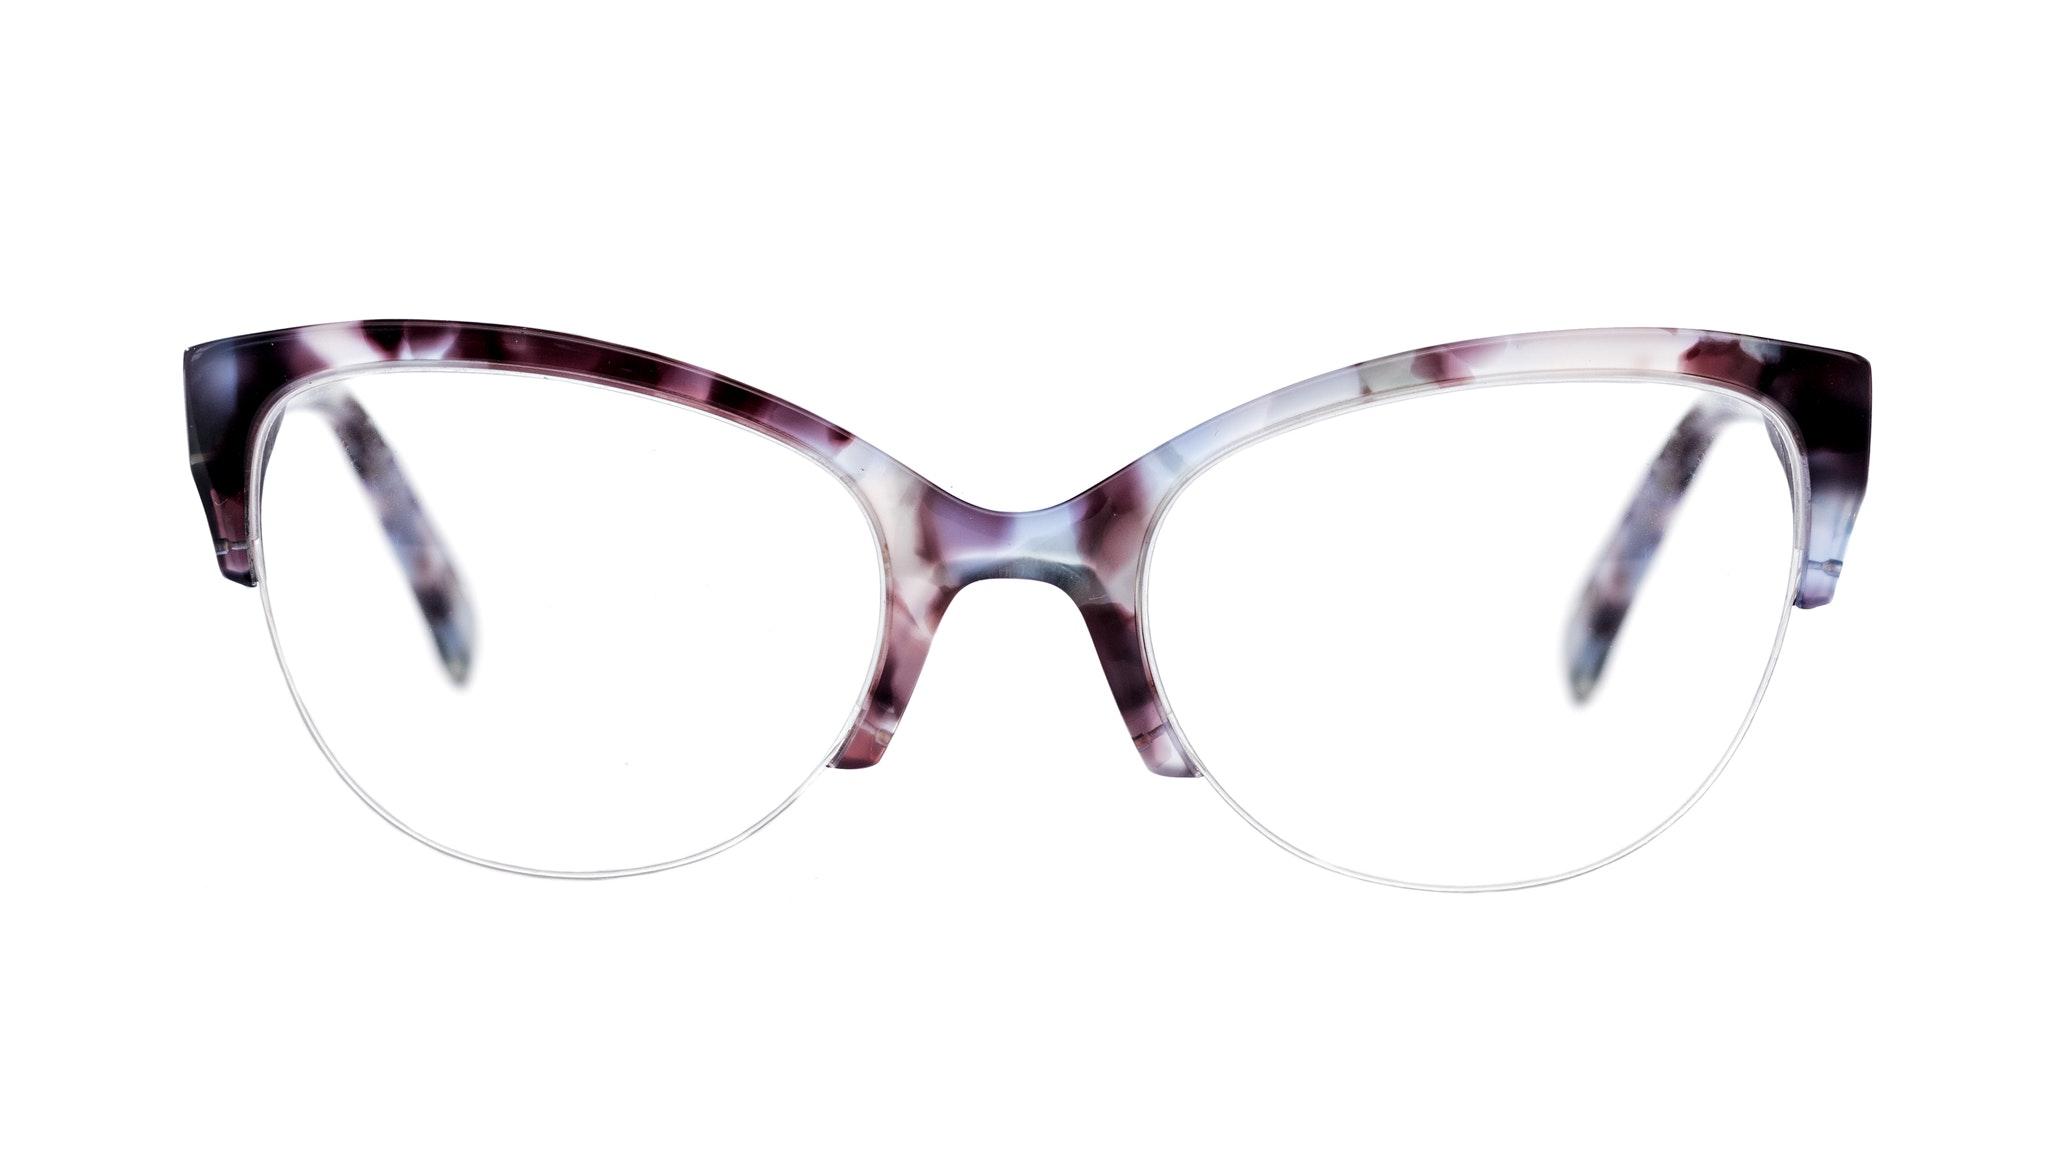 Affordable Fashion Glasses Cat Eye Eyeglasses Women Lovely Lilac Tort Front